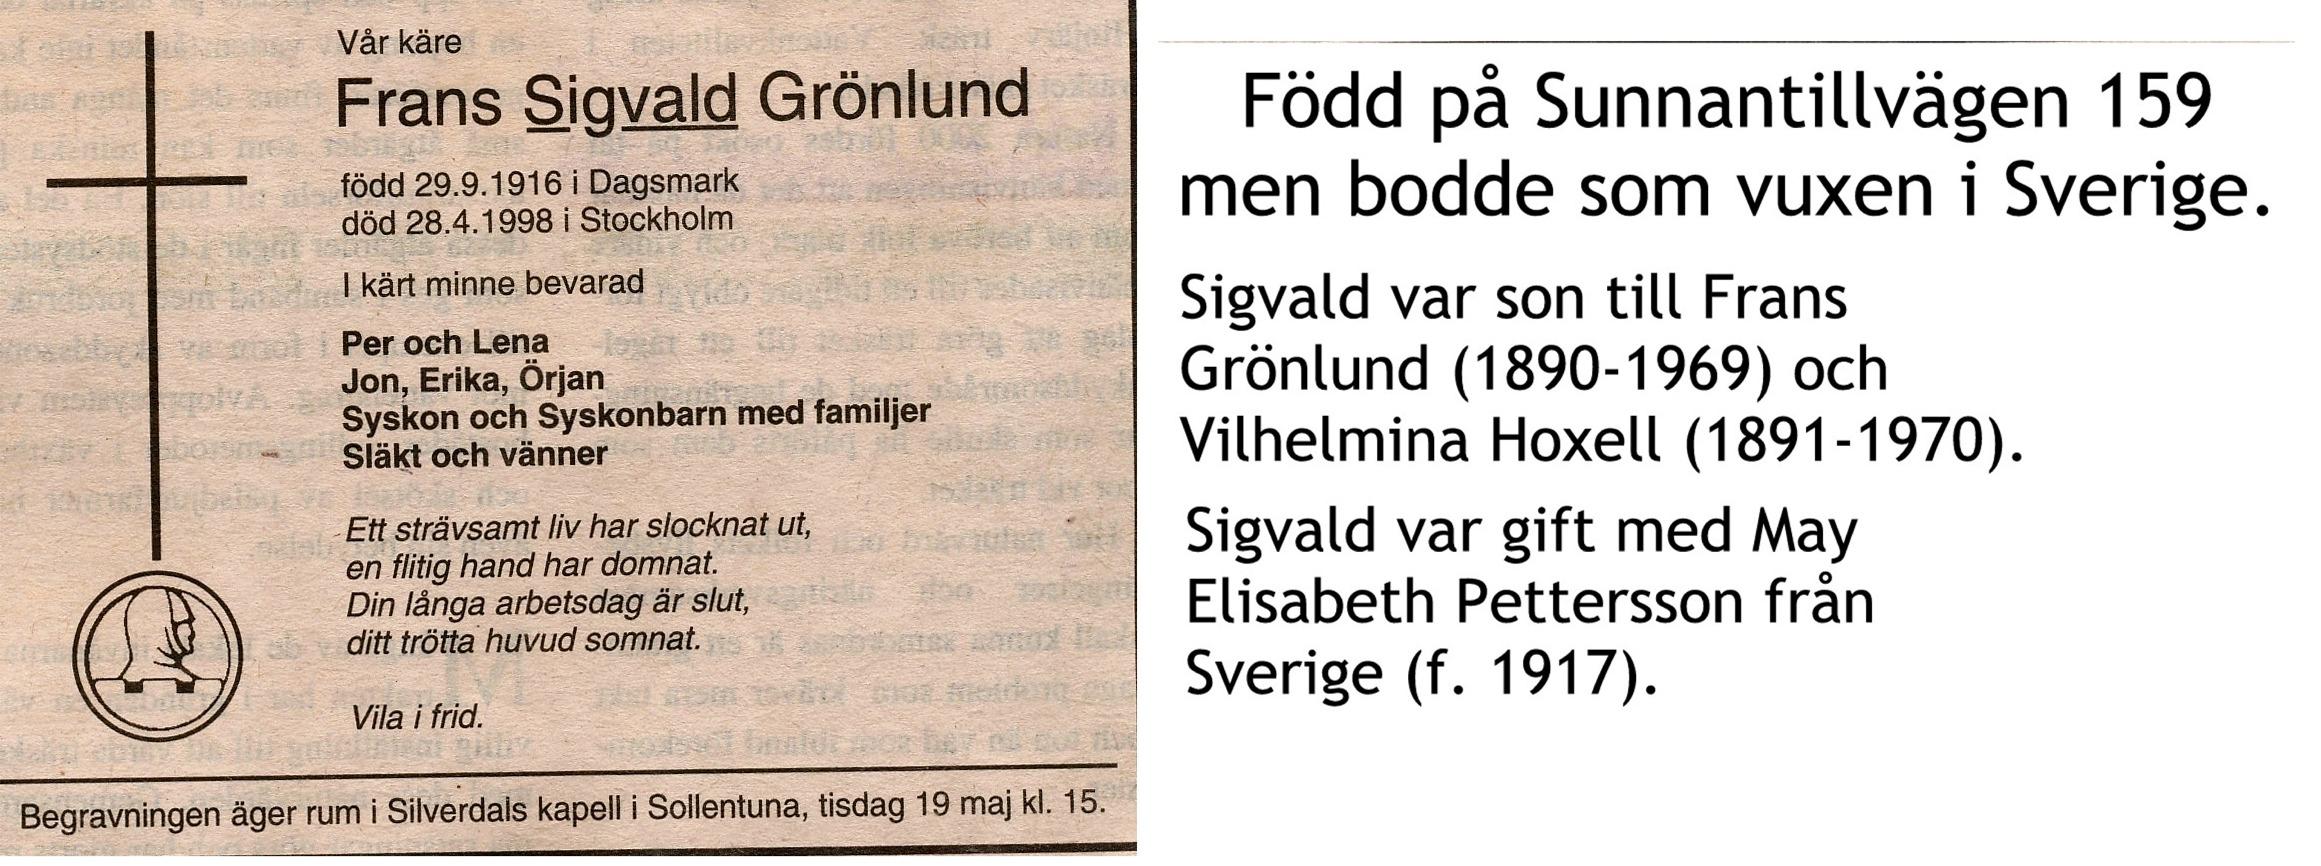 Grönlund Sigvald